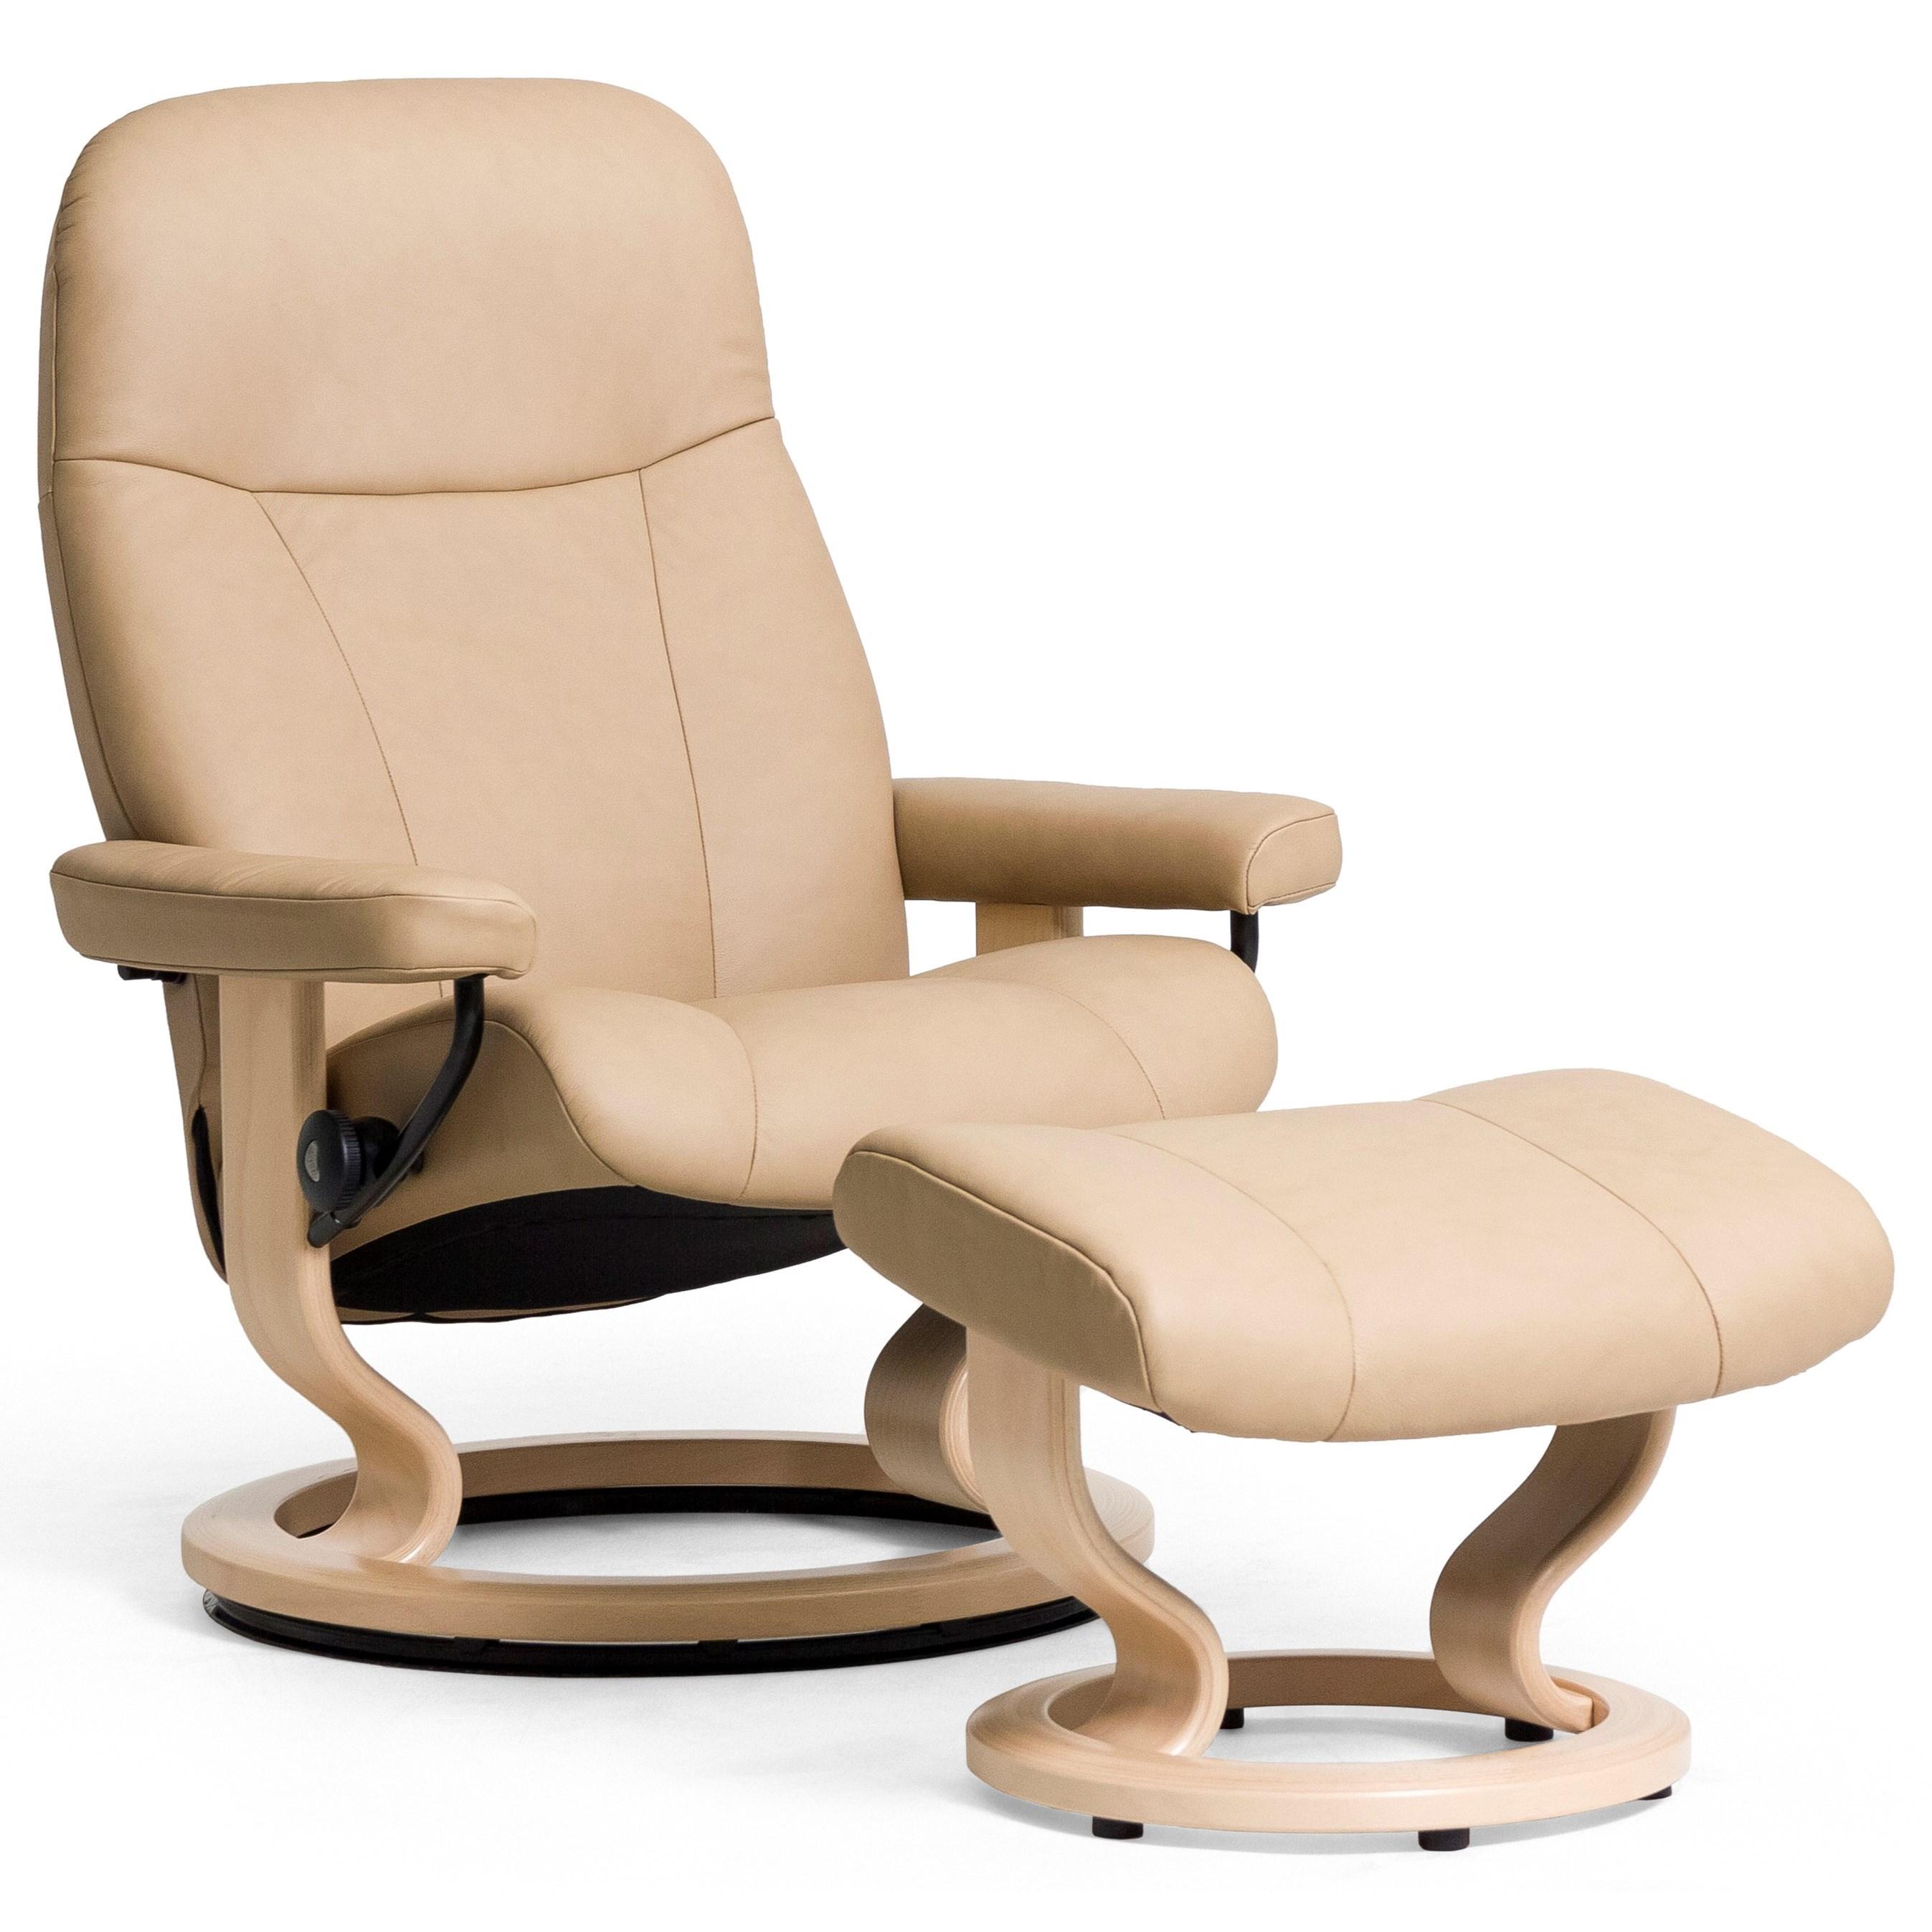 Stressless by Ekornes Garda Medium Stressless Chair & Ottoman - Item Number: 13290150942101